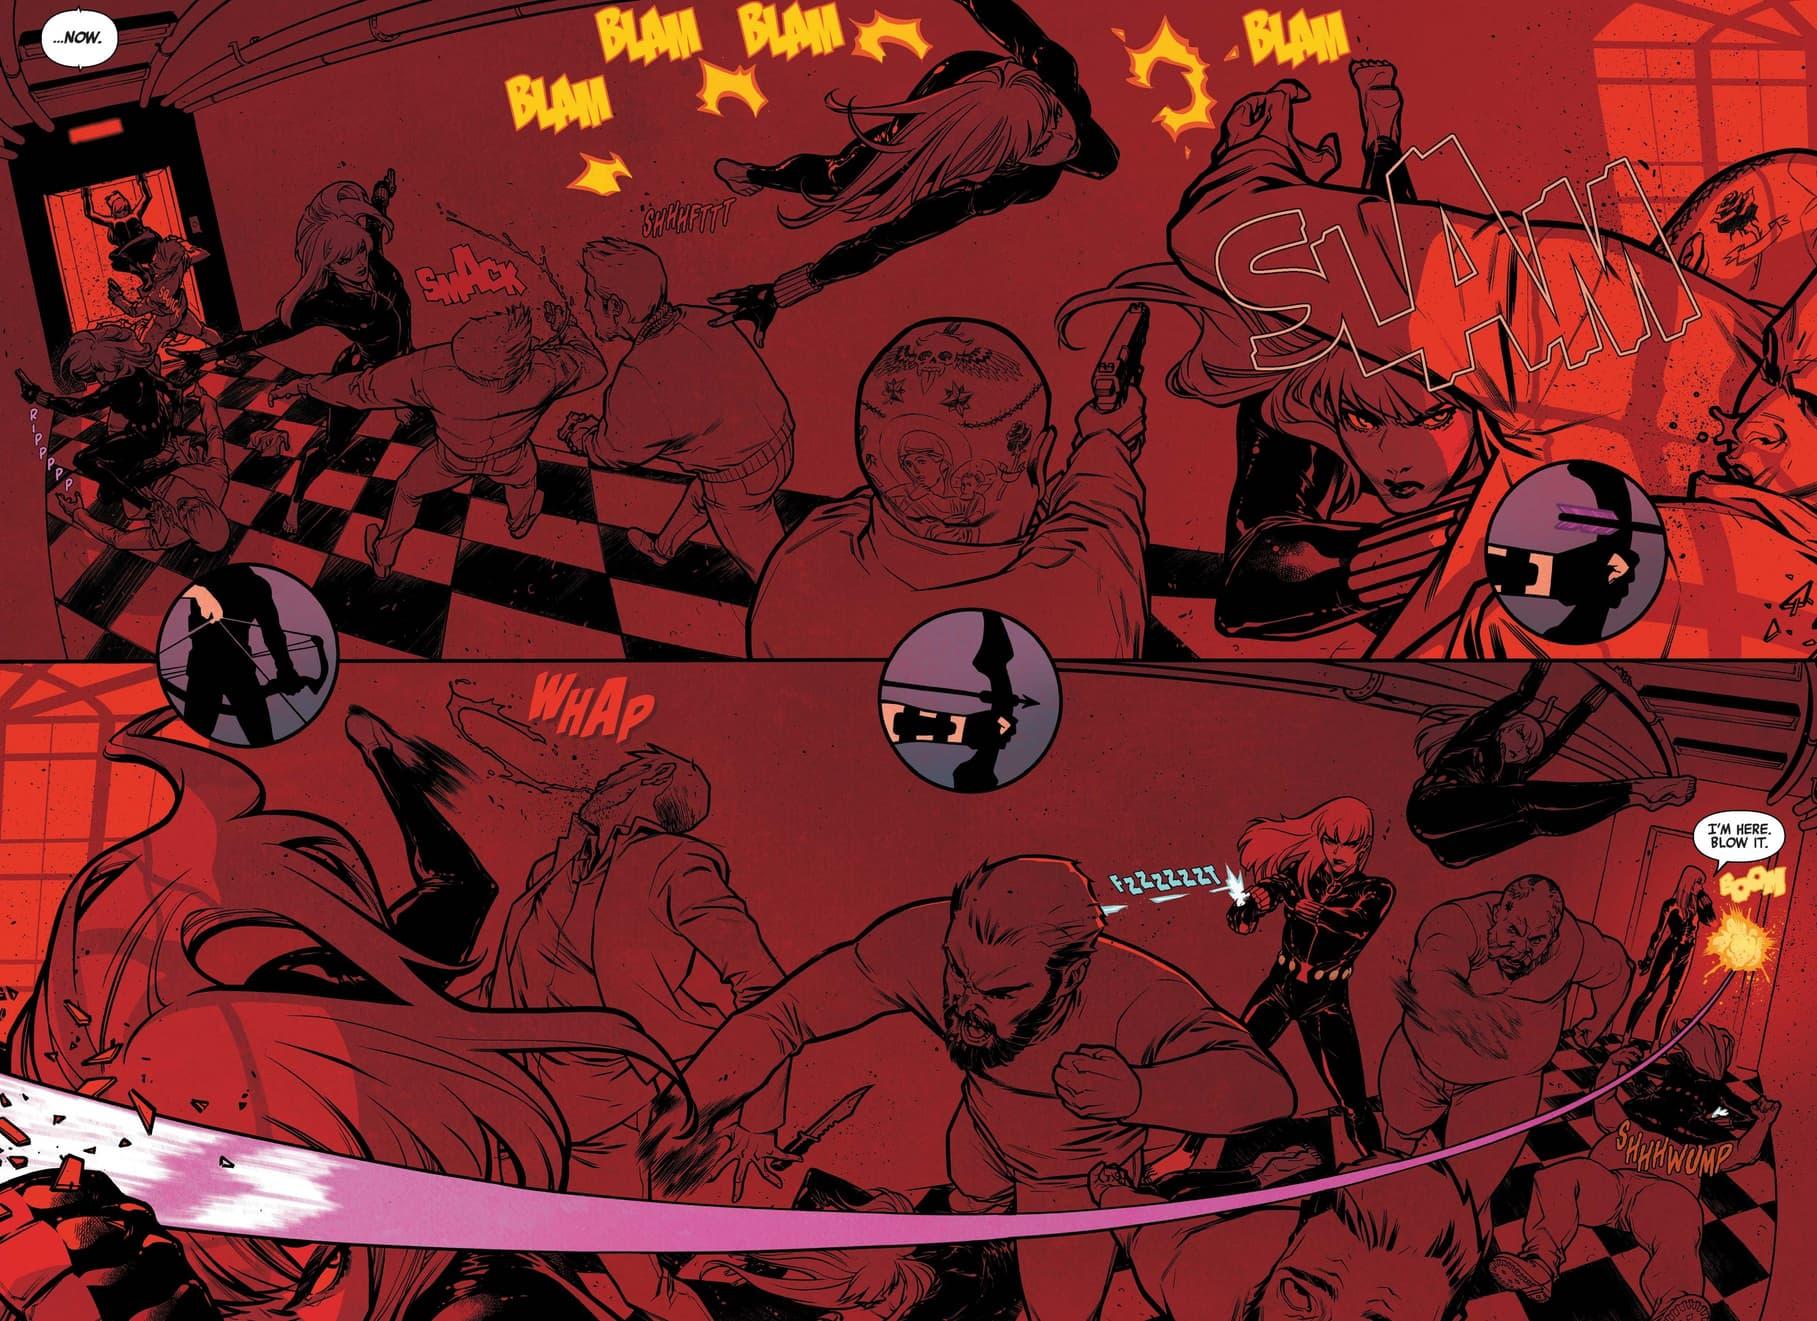 Natasha kicks up some conflict in Black Widow (2020) #1.